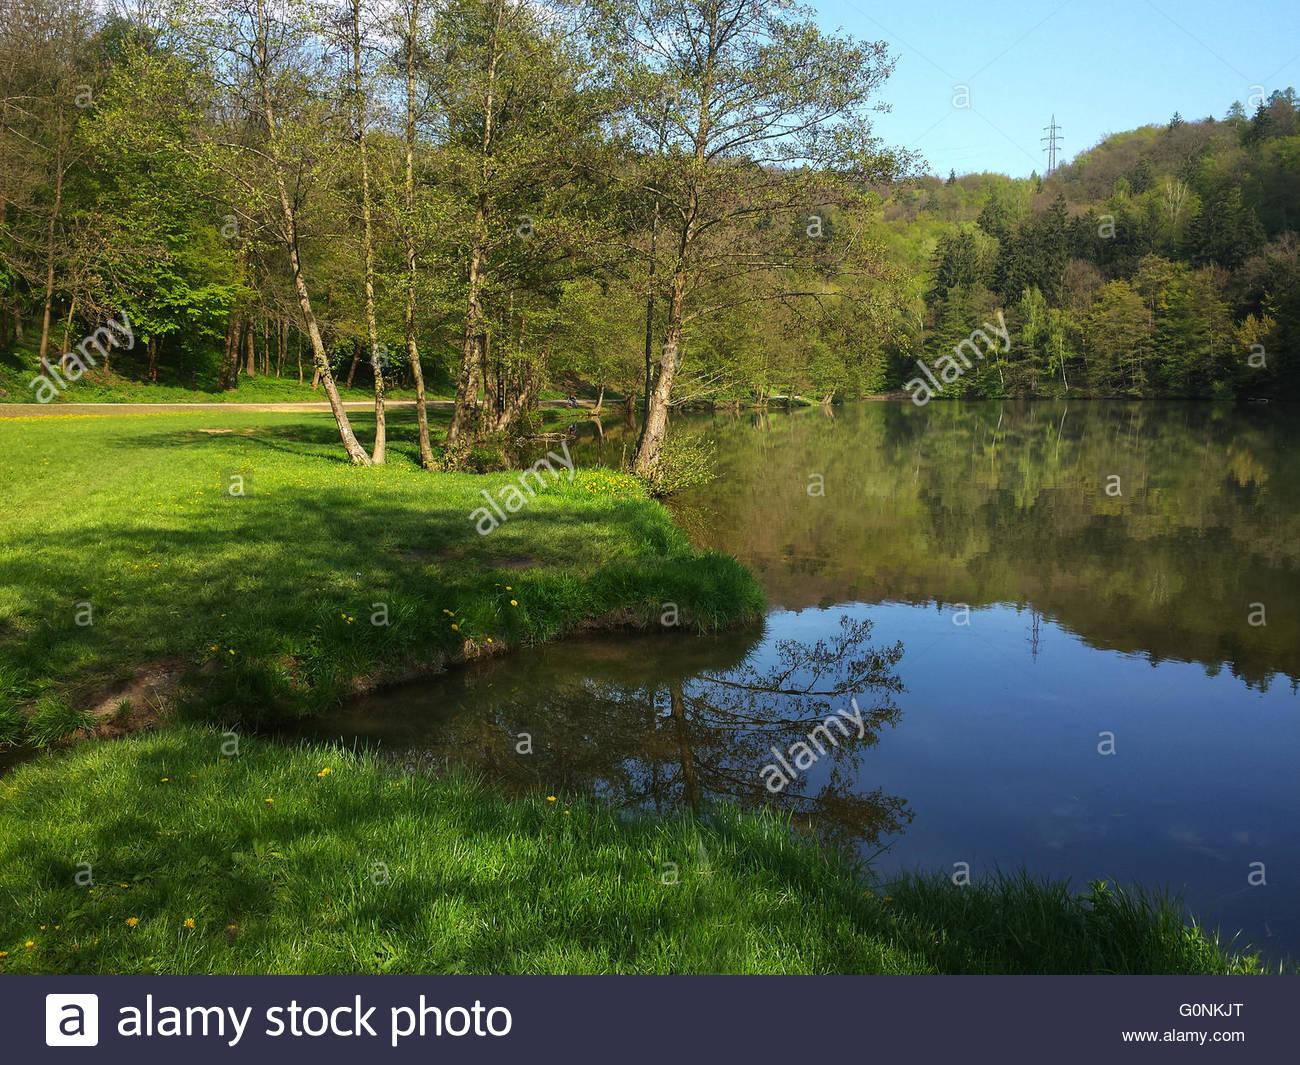 Beautiful sunny spring day in Marianske Udoli near Brno, Czech Republic. Phone photo - Stock Image